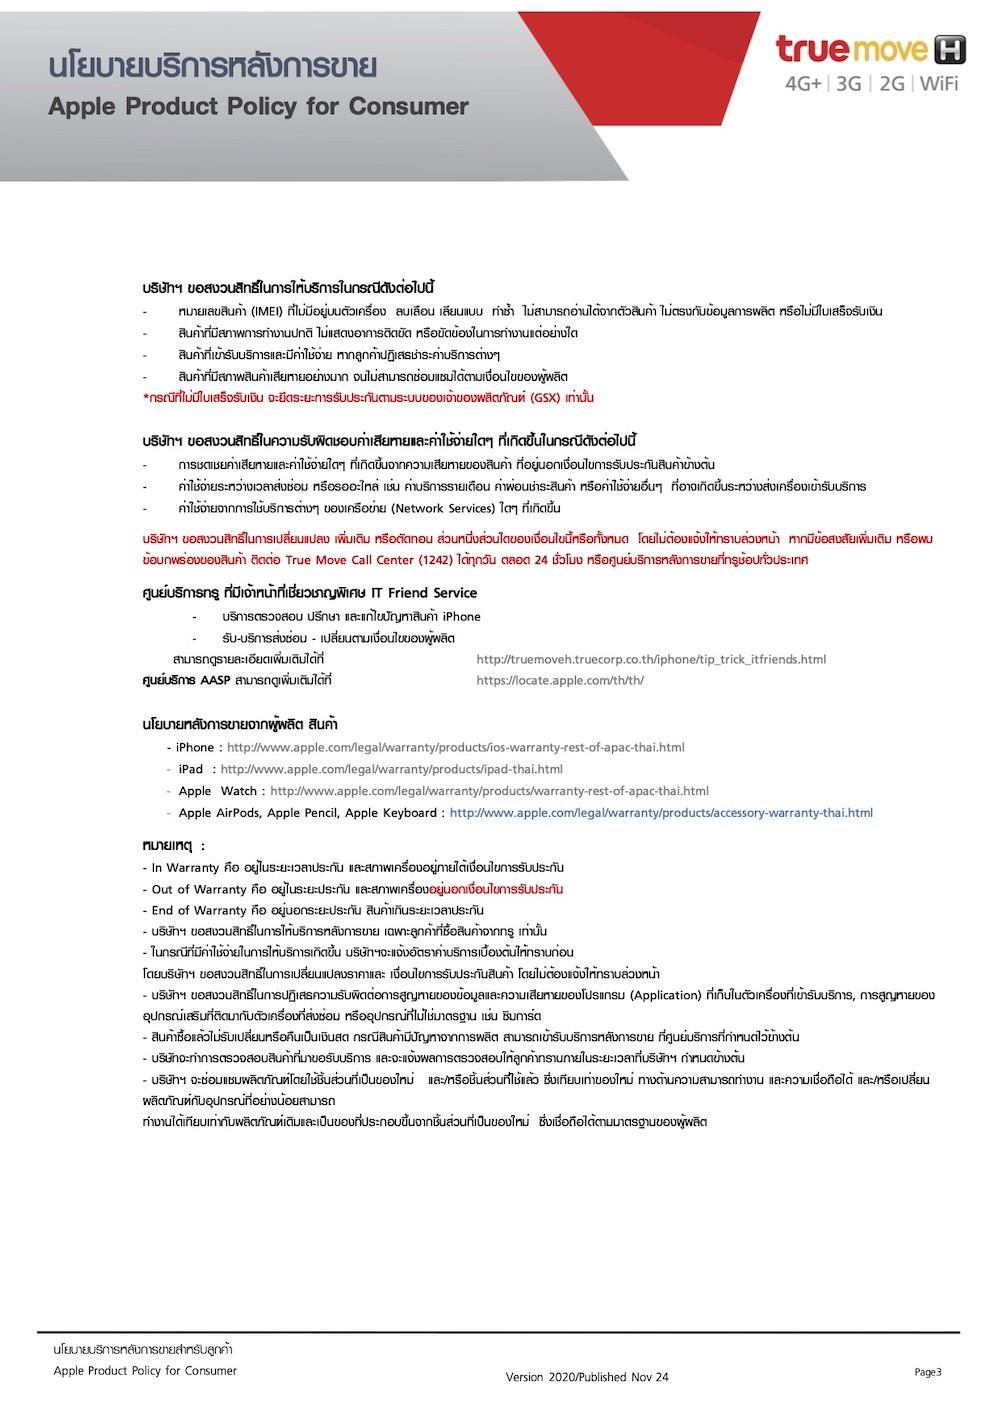 3-dafs_policy_consumer_apple_nov242020.j